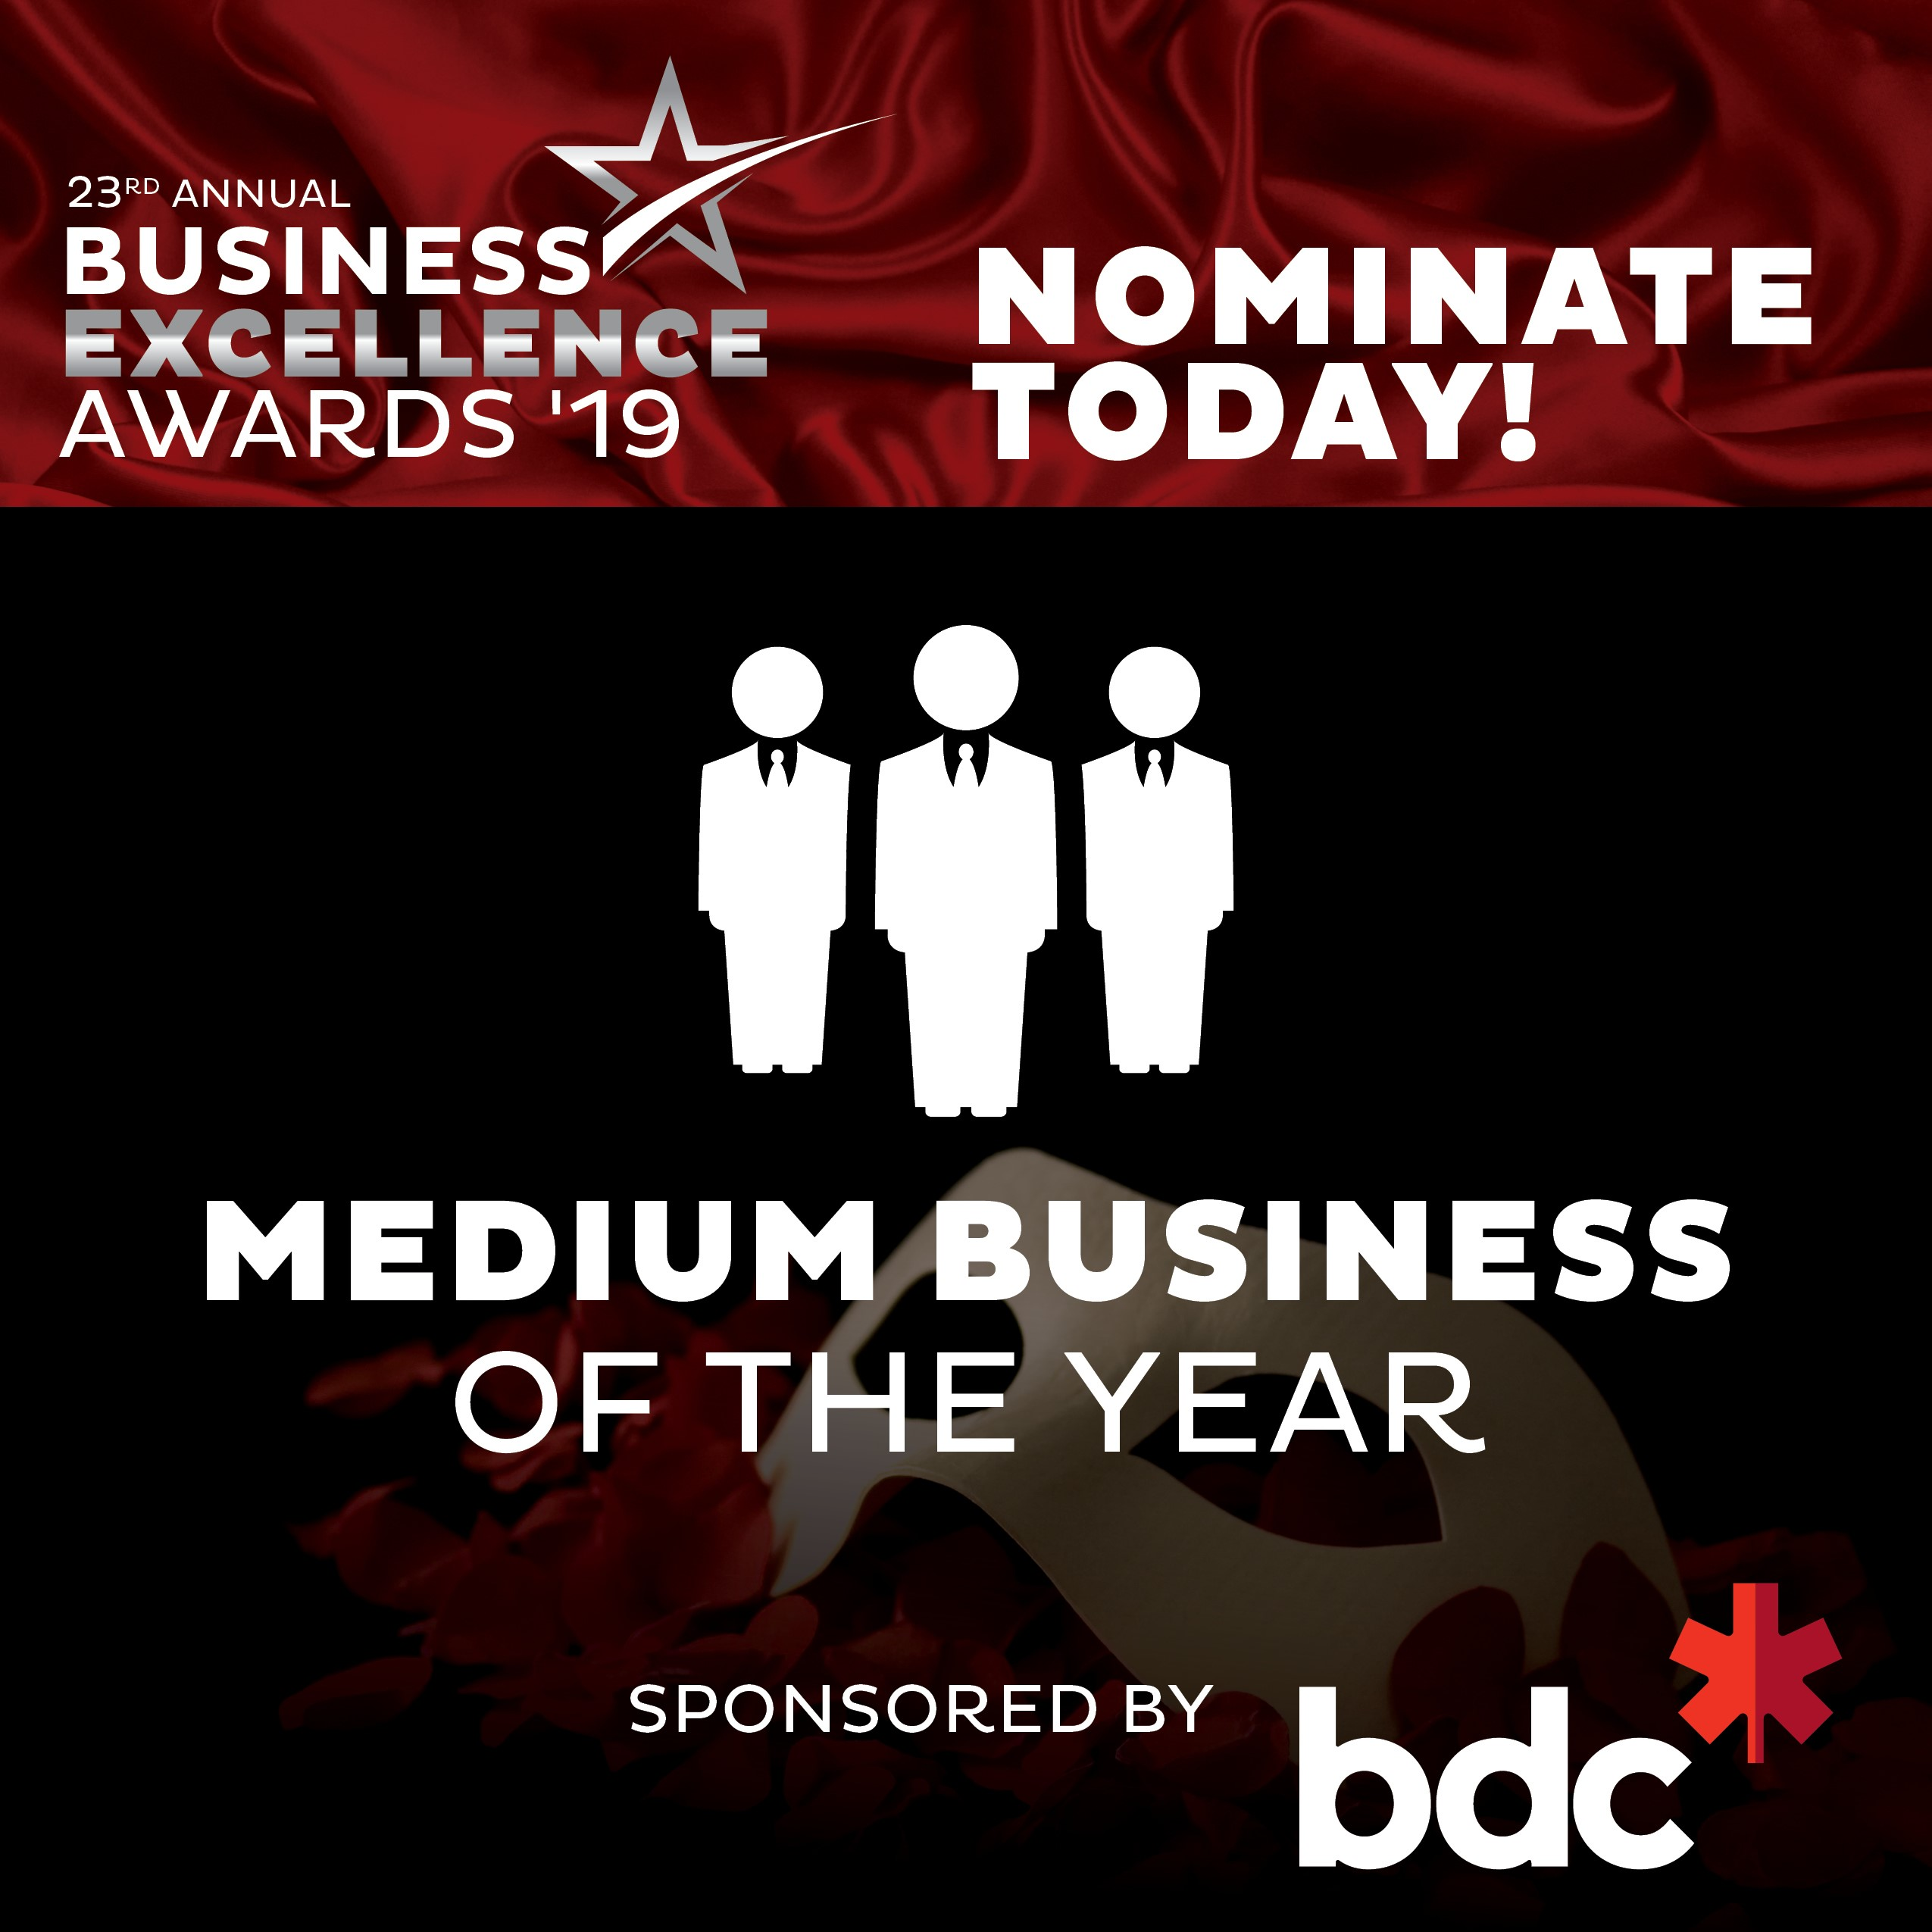 2018-Medium-Business-of-the-Year---BDO-copy.jpg